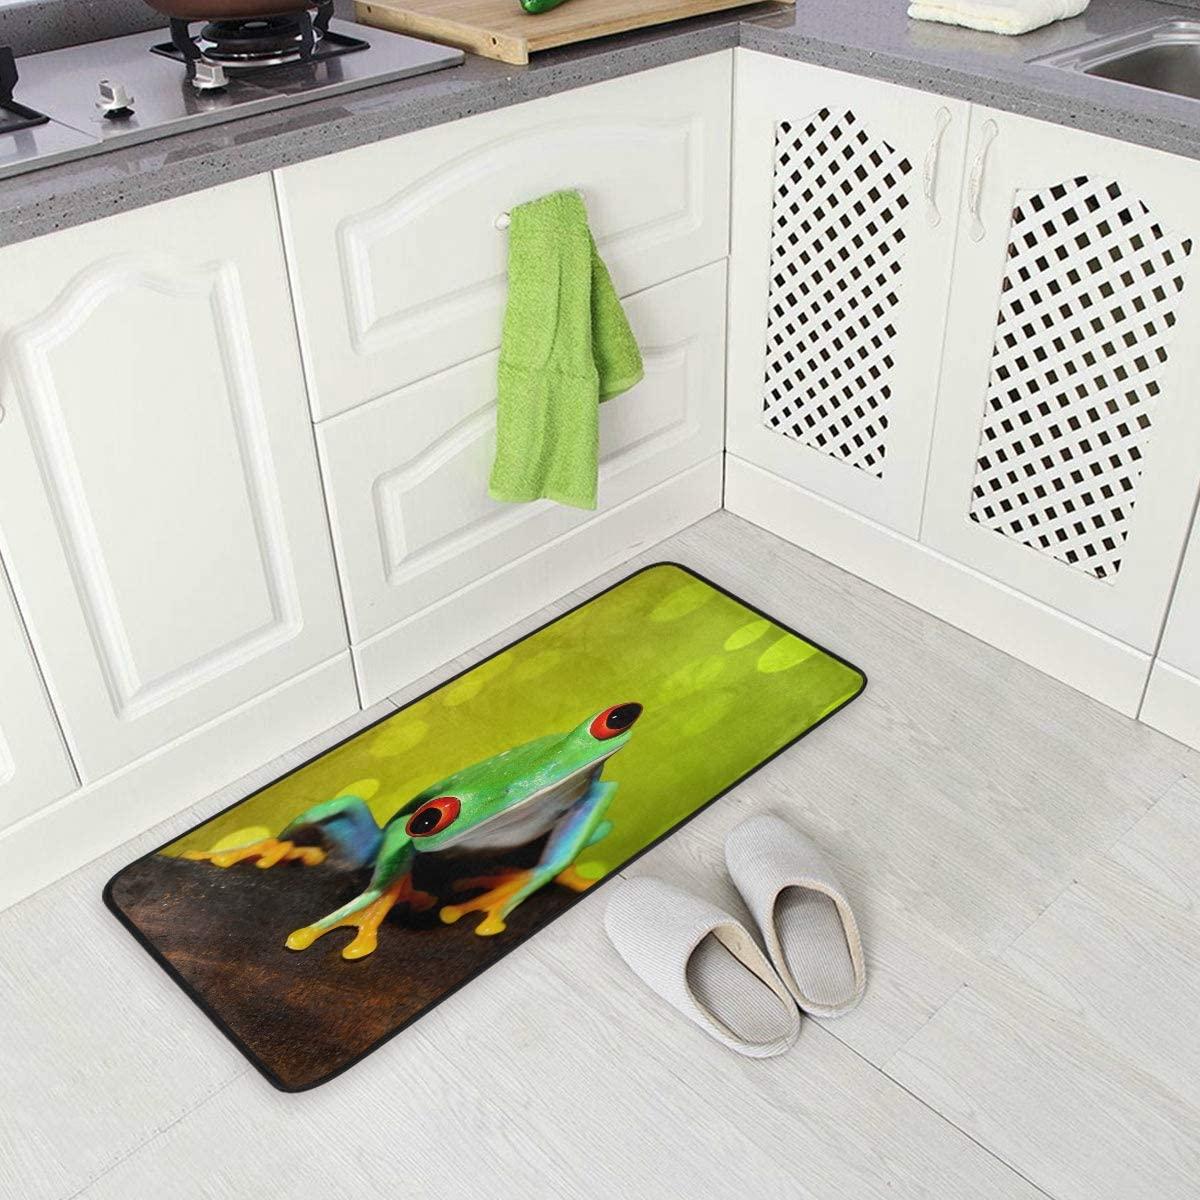 ALAZA Red Eye Tree Frog Non Slip Kitchen Floor Mat Kitchen Rug for Entryway Hallway Bathroom Living Room Bedroom 39 x 20 inches(1.7' x 3.3')